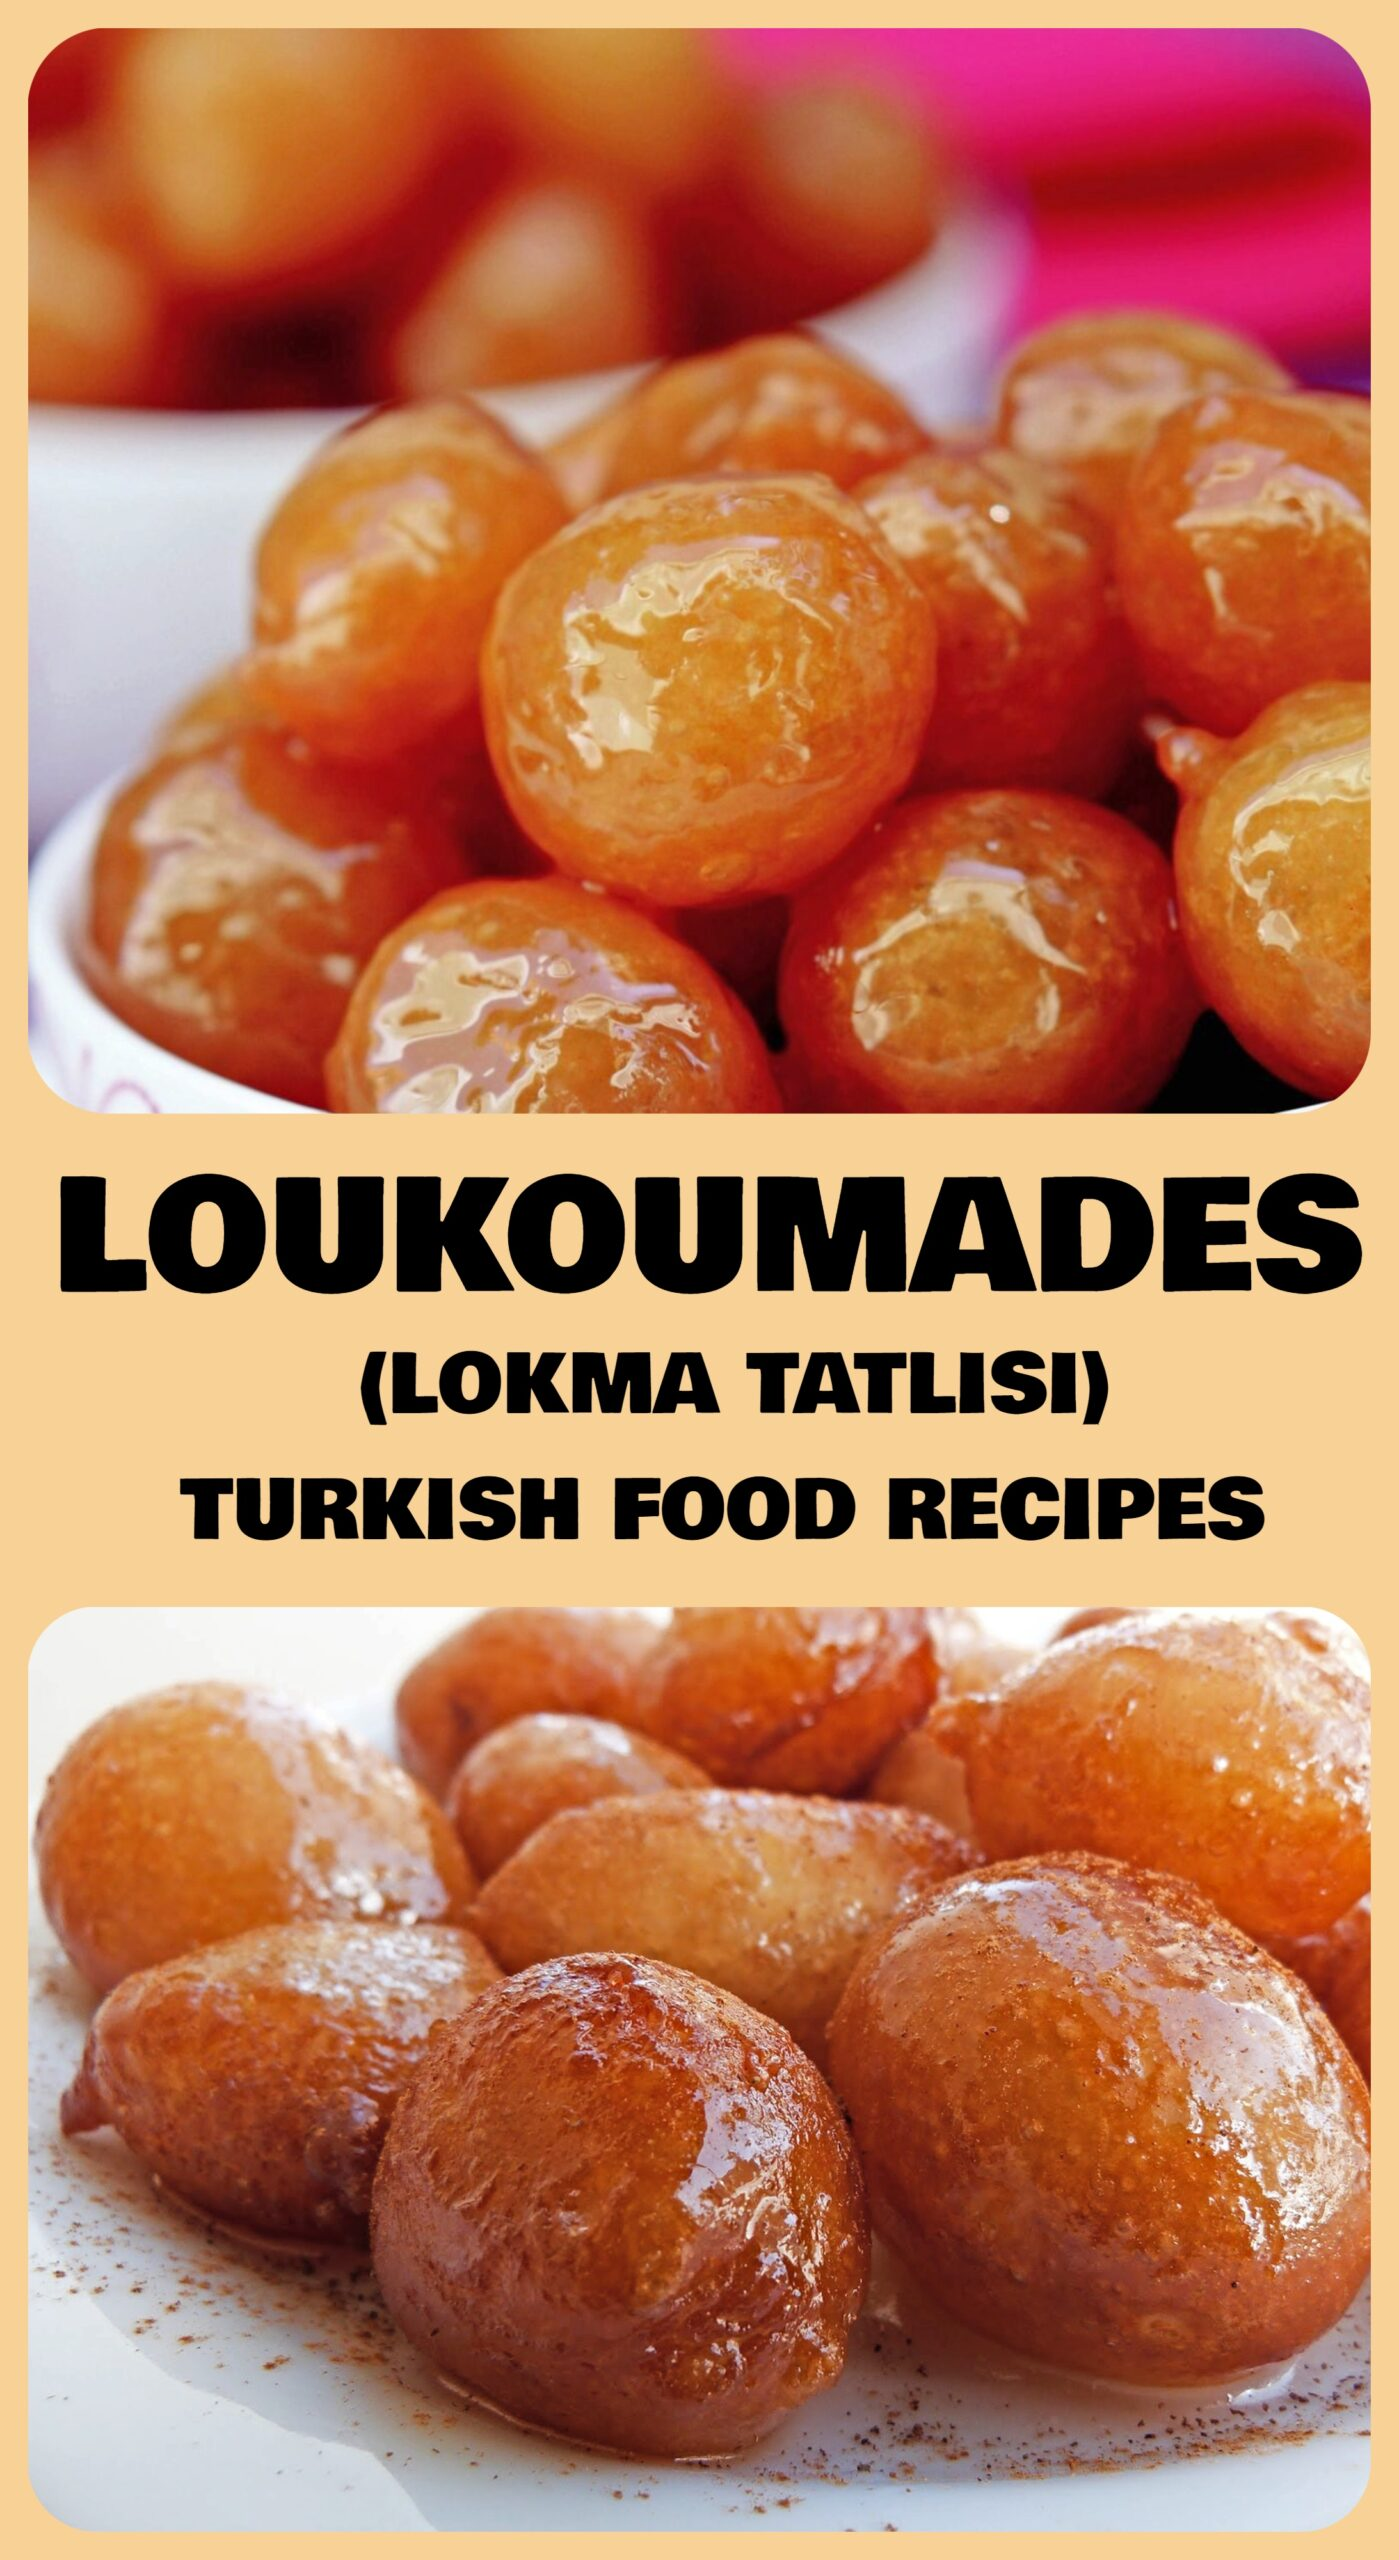 Loukoumades - Lokma Tatlisi Recipe